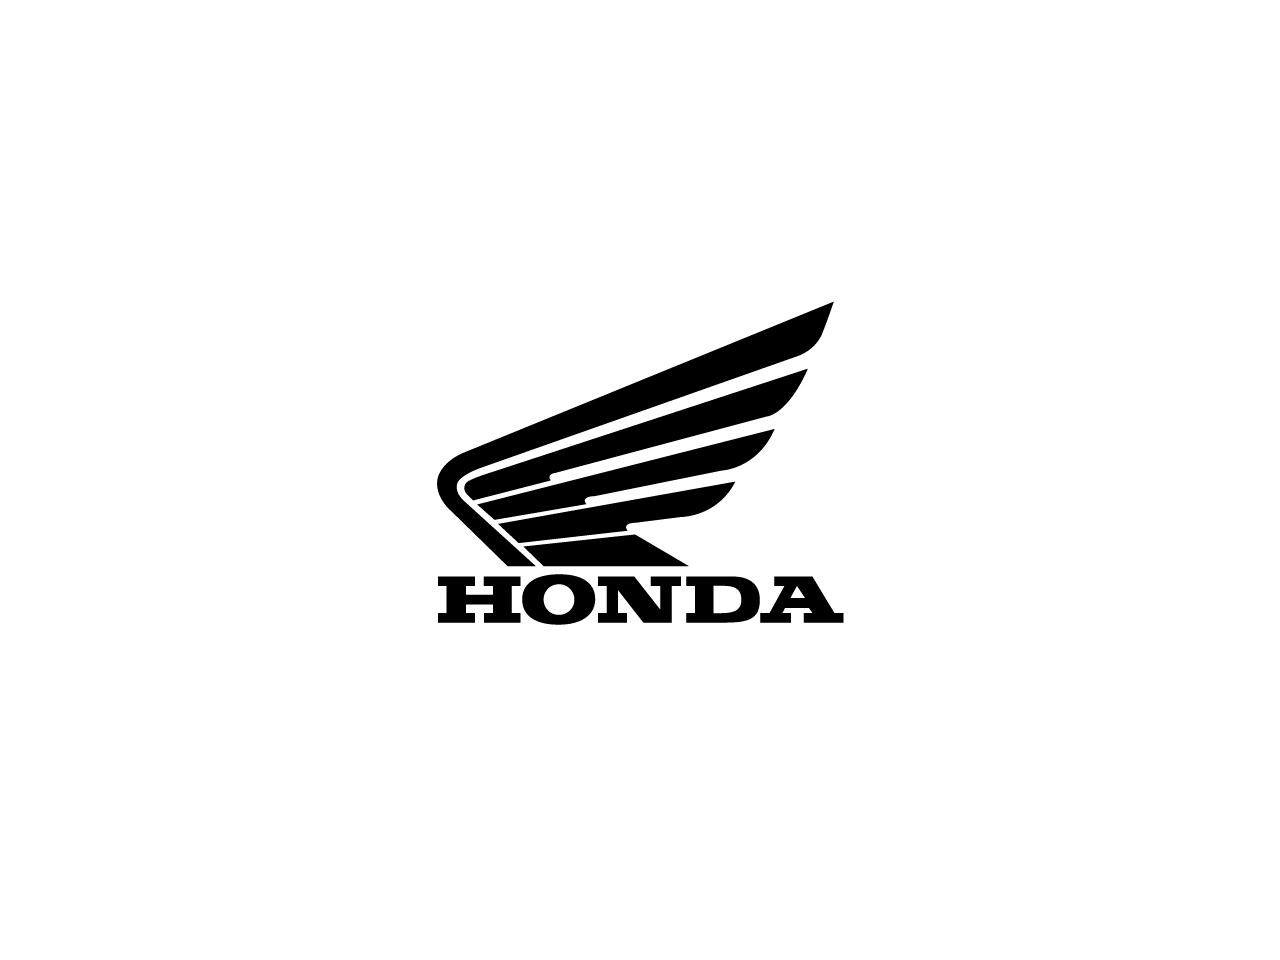 Logo honda motos clipart graphic free stock Free Honda Logo Cliparts, Download Free Clip Art, Free Clip ... graphic free stock